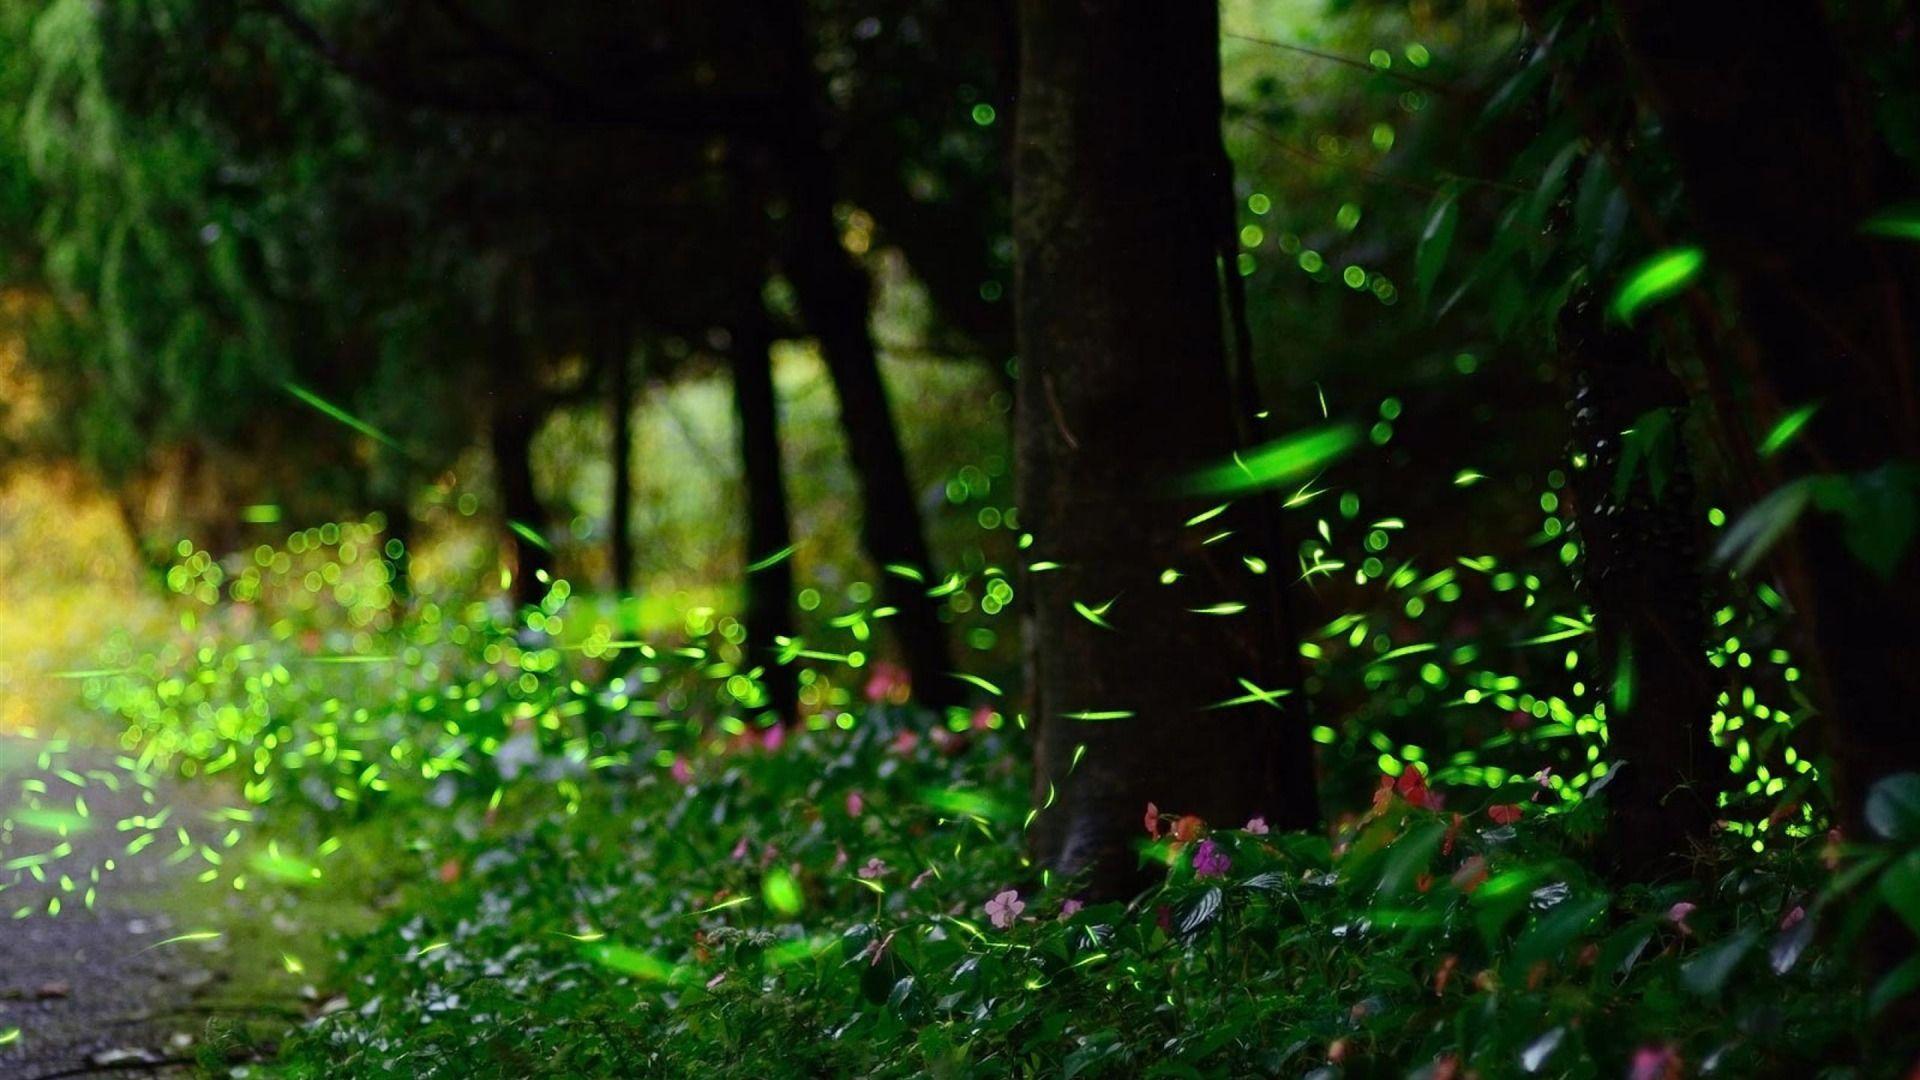 Firefly HD Wallpaper | wallpapers | Pinterest | Fireflies, Hd ... for Firefly Insect Wallpaper  181obs